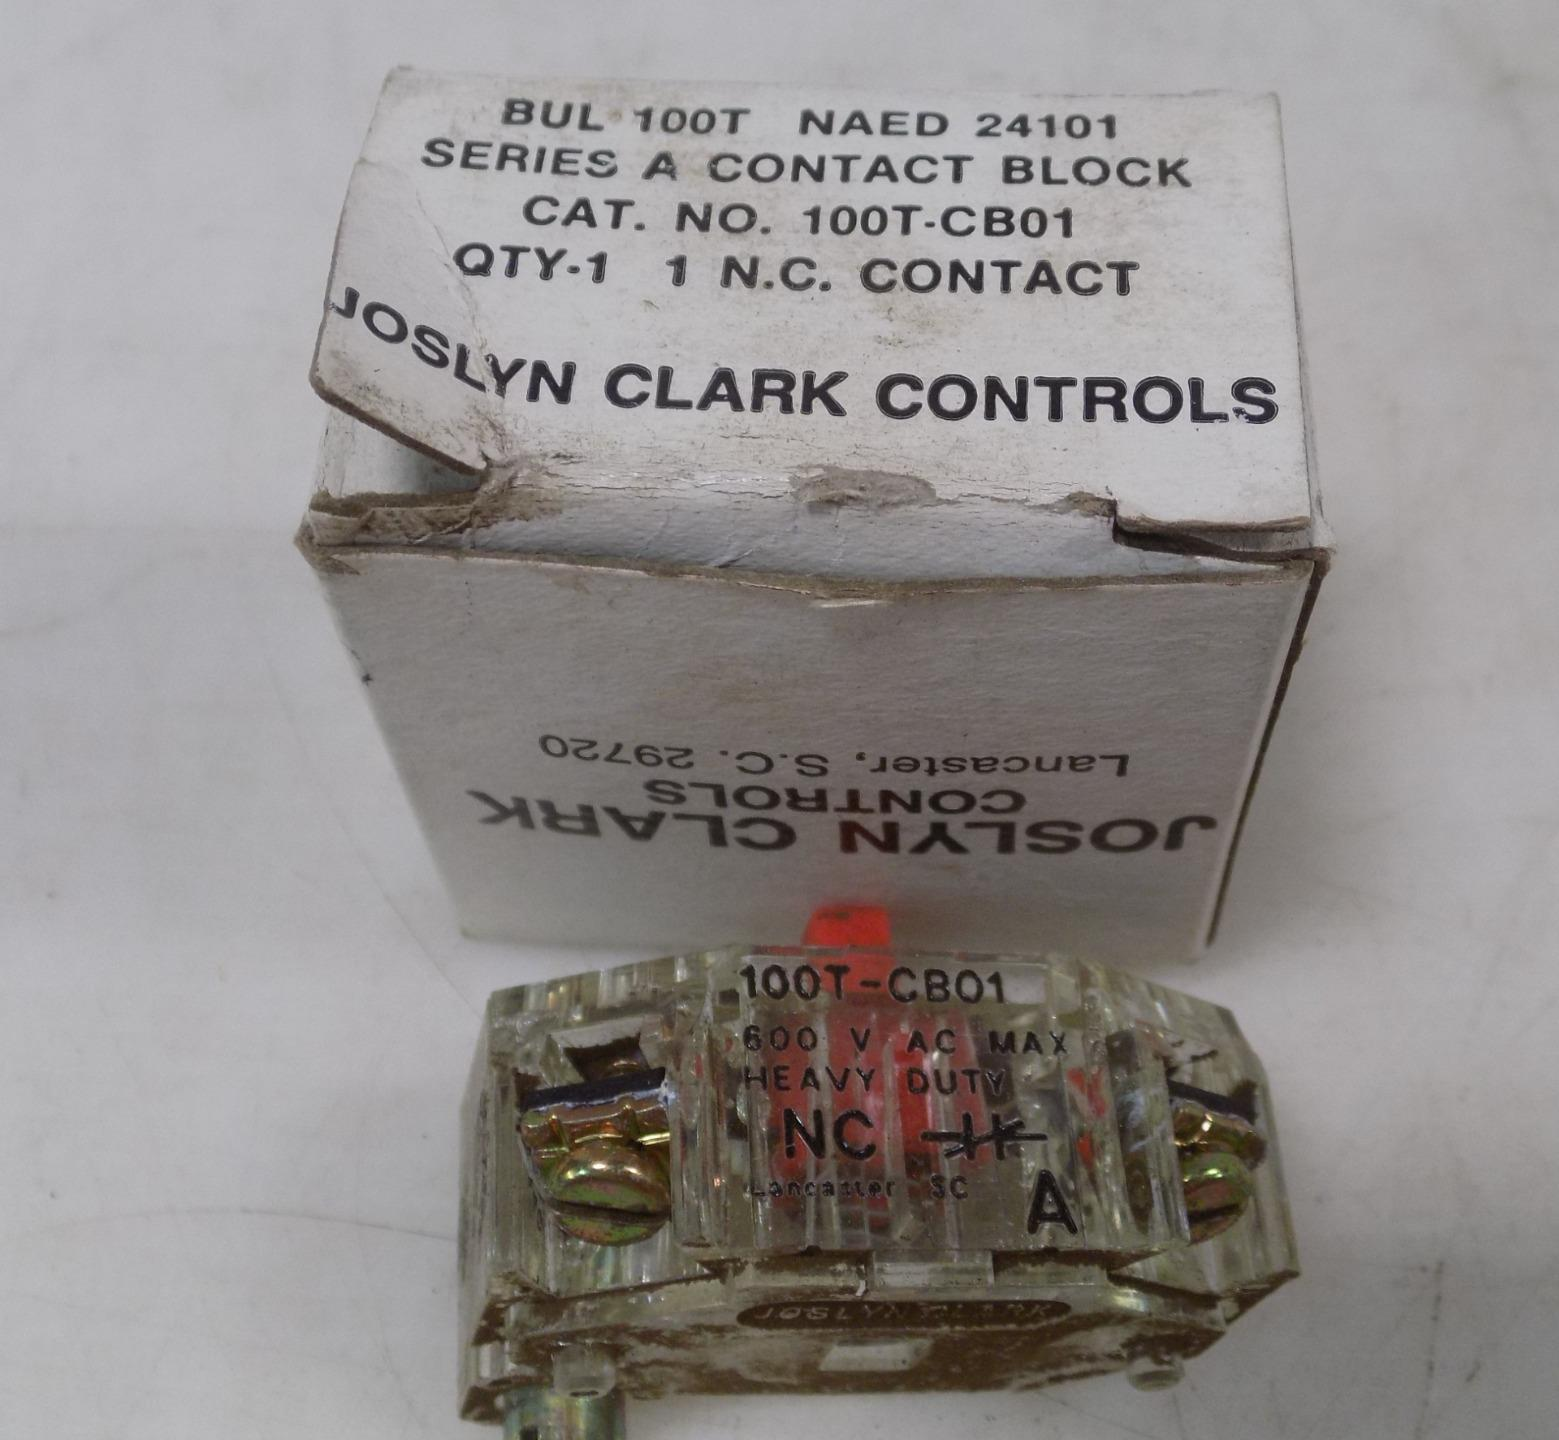 Joslyn Clark BUL 100T-CB01 Series A Contact NAED 24101 N.C Contact NEW